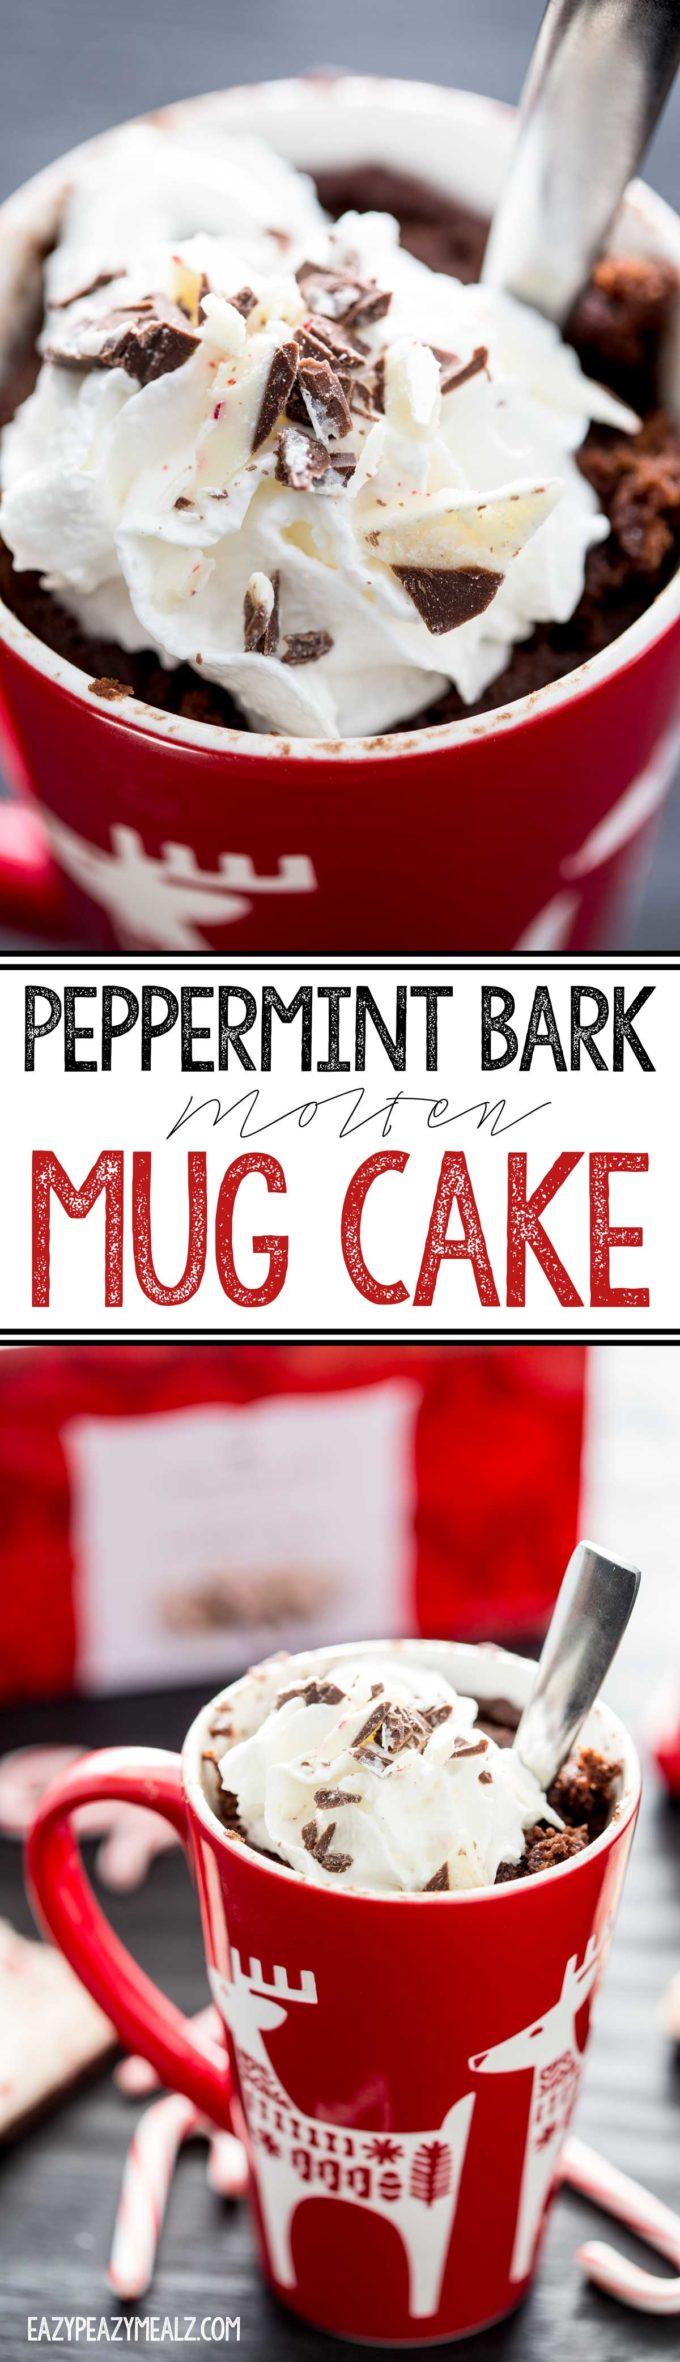 pin-for-mug-cake